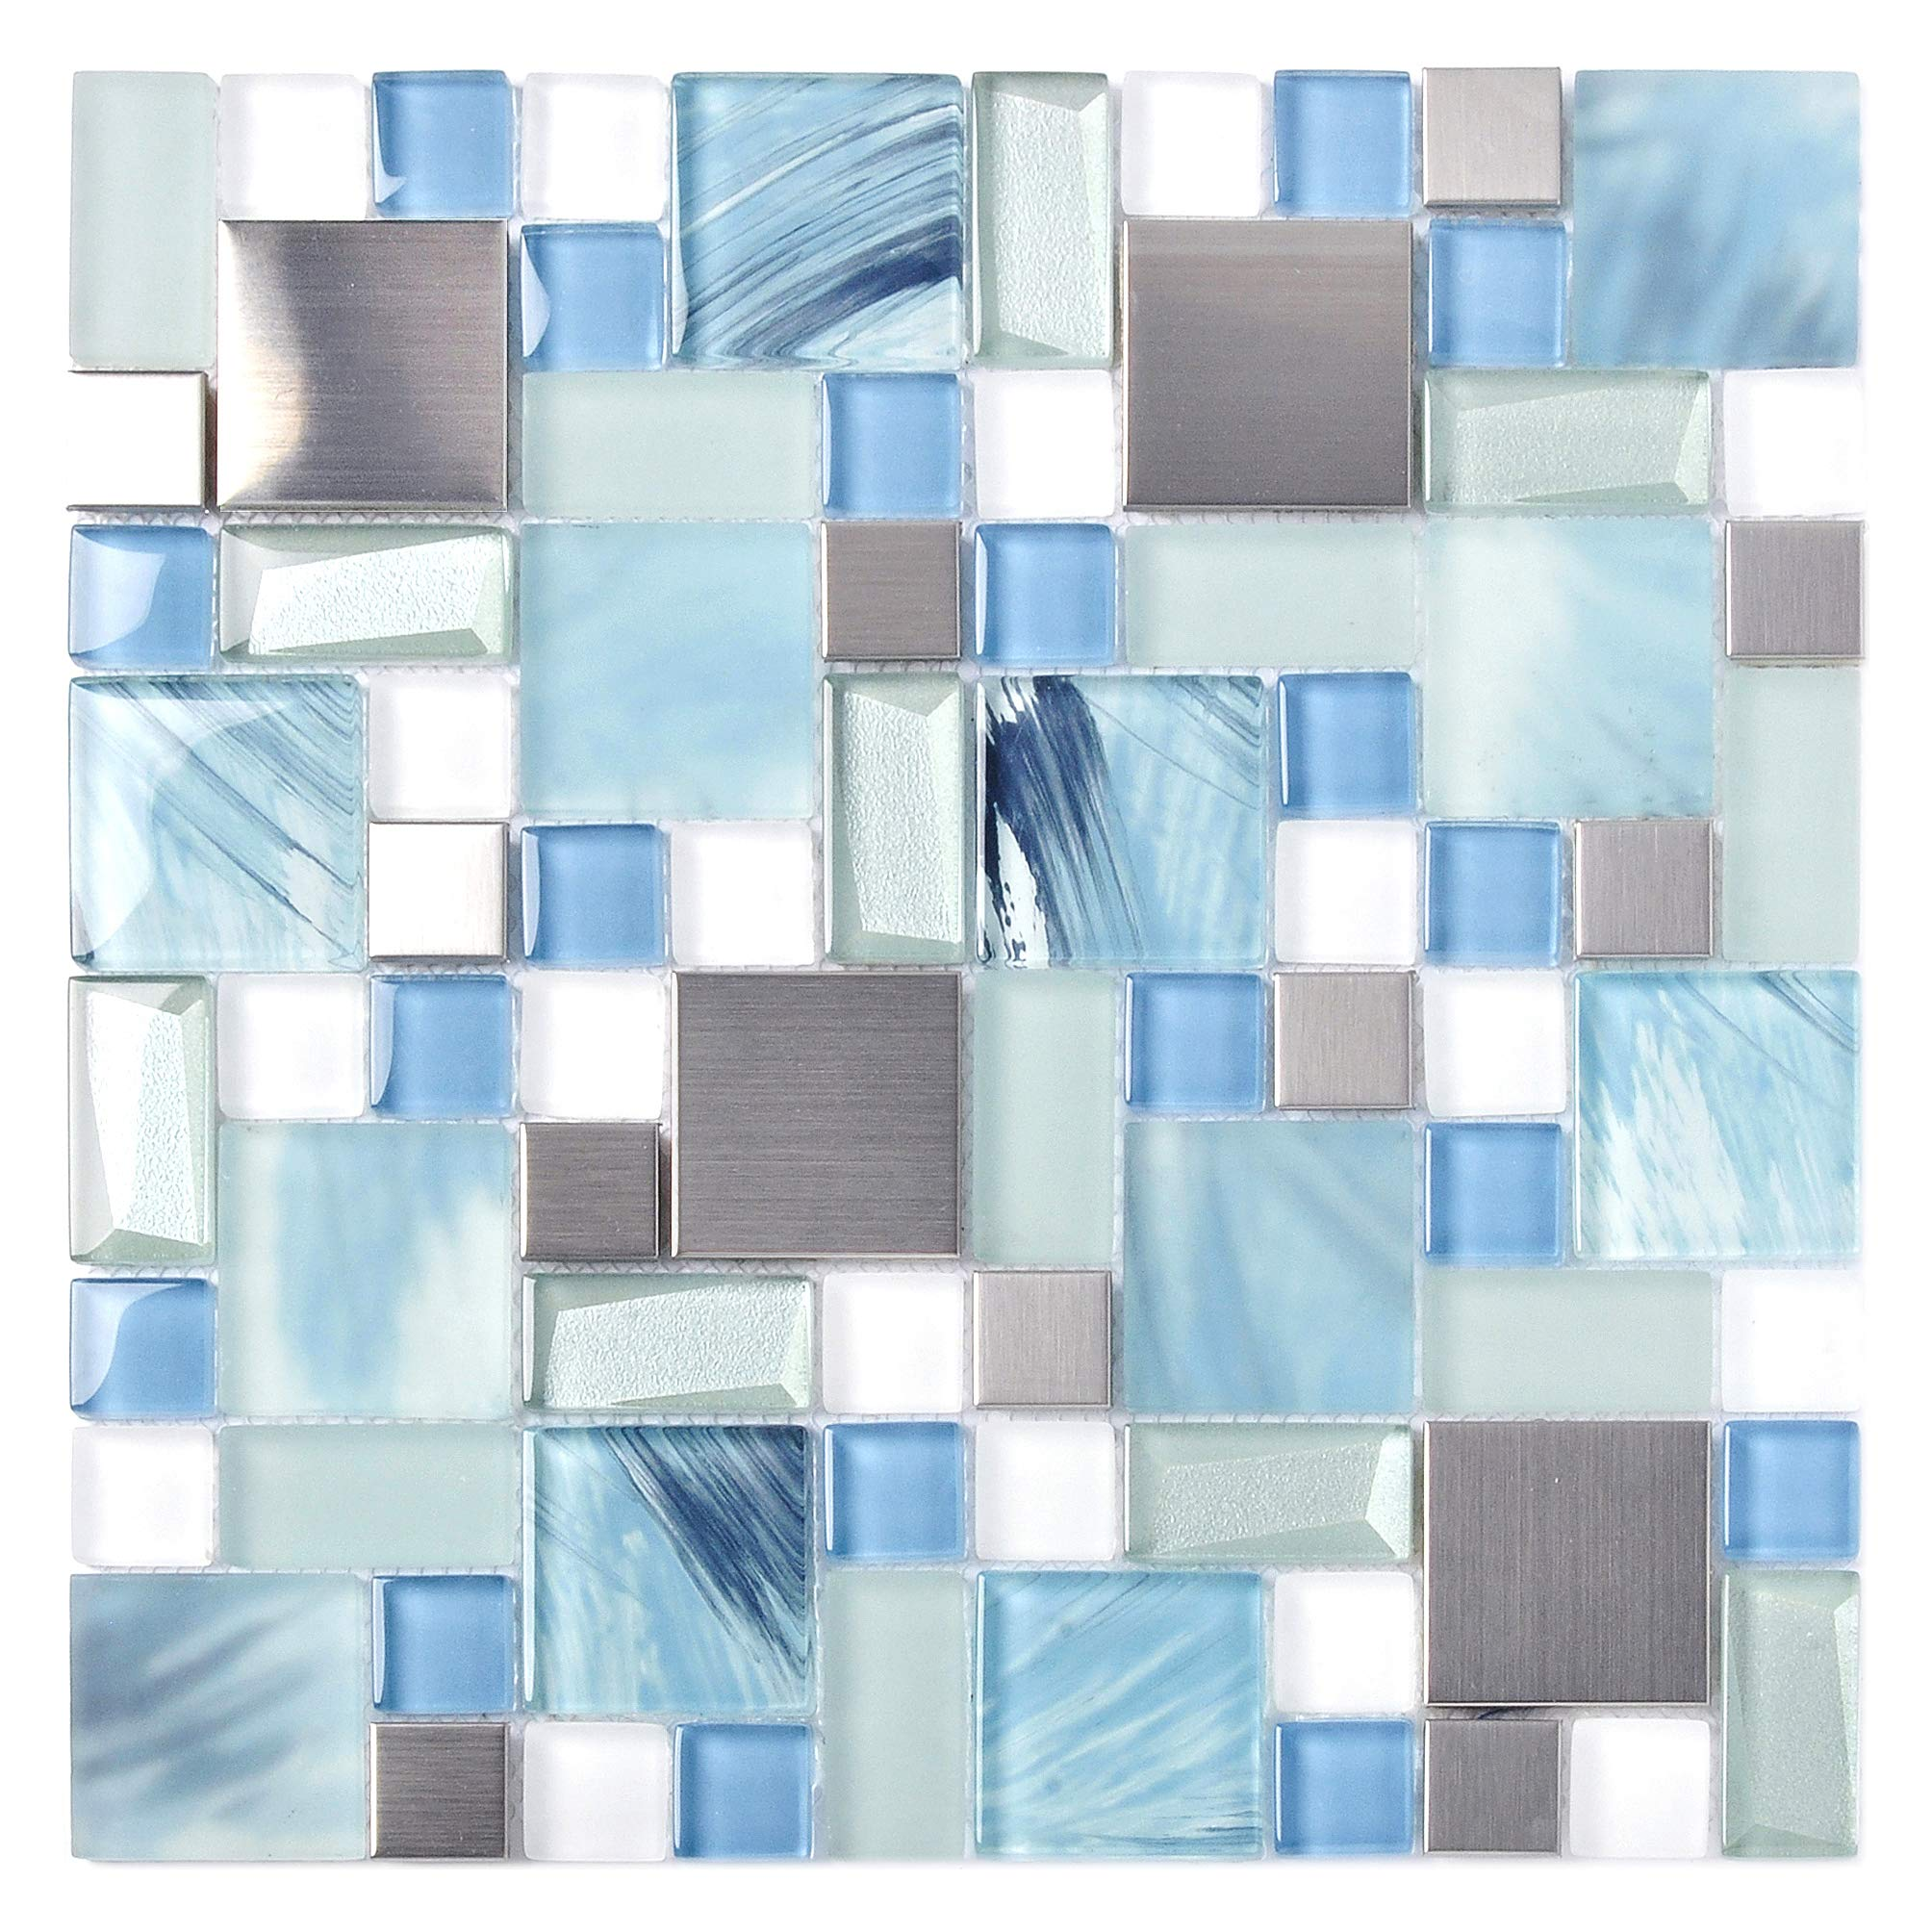 Sea Blue Green Glass Stainless Steel Tile White Kitchen Bath Backsplash Artistic Mosaic TSTMGB028 (5 Square Feet) by BLUJELLYFISH